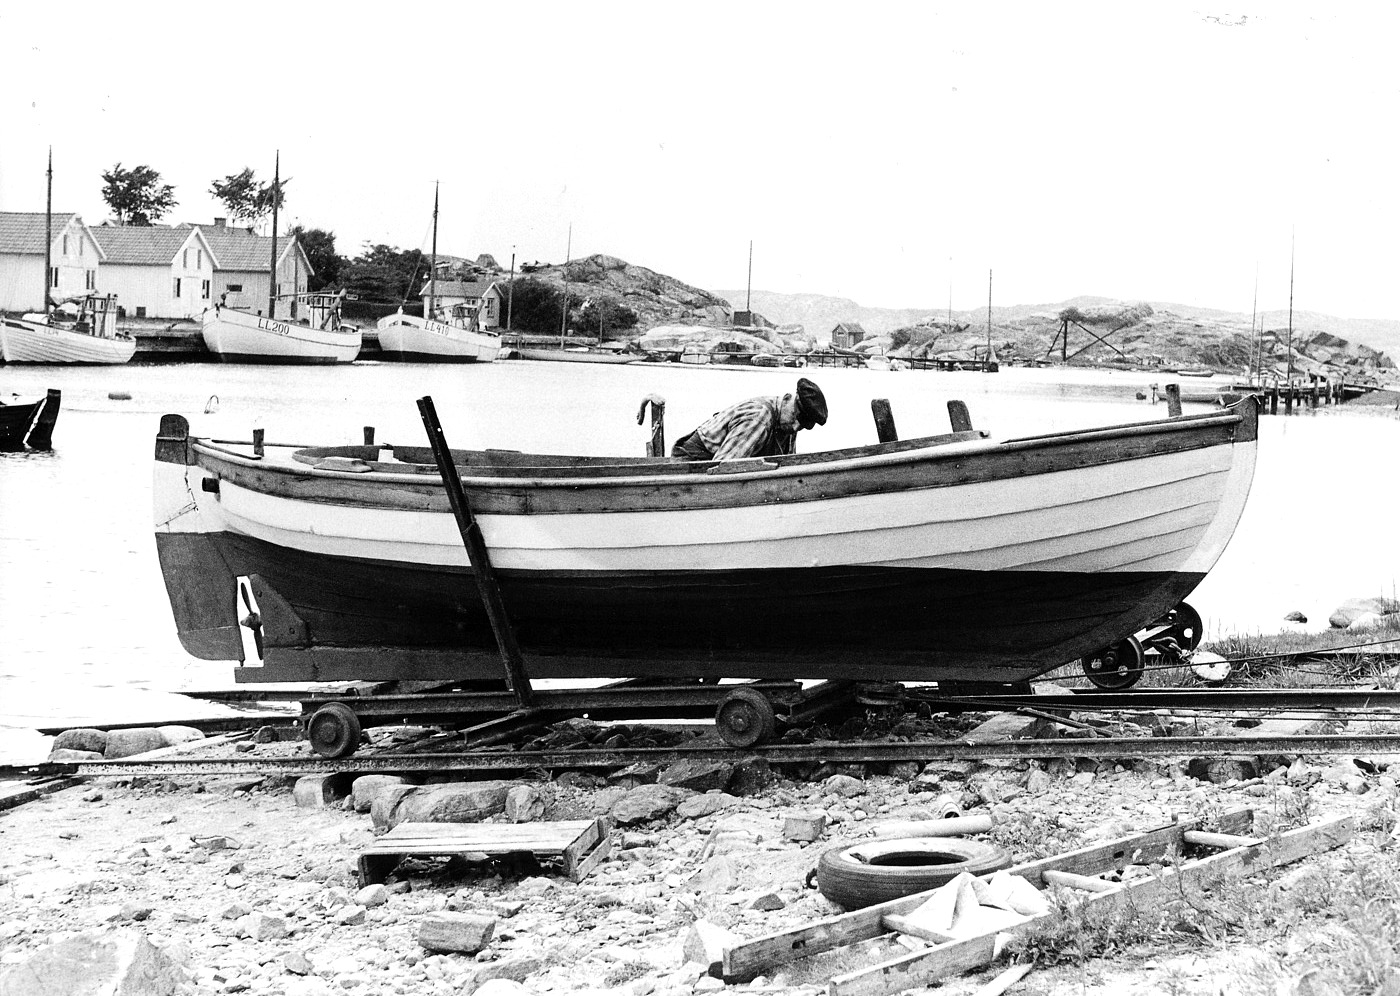 Foto Claes Funck 1963. Fiskehamn, båt på slip, Kalven.